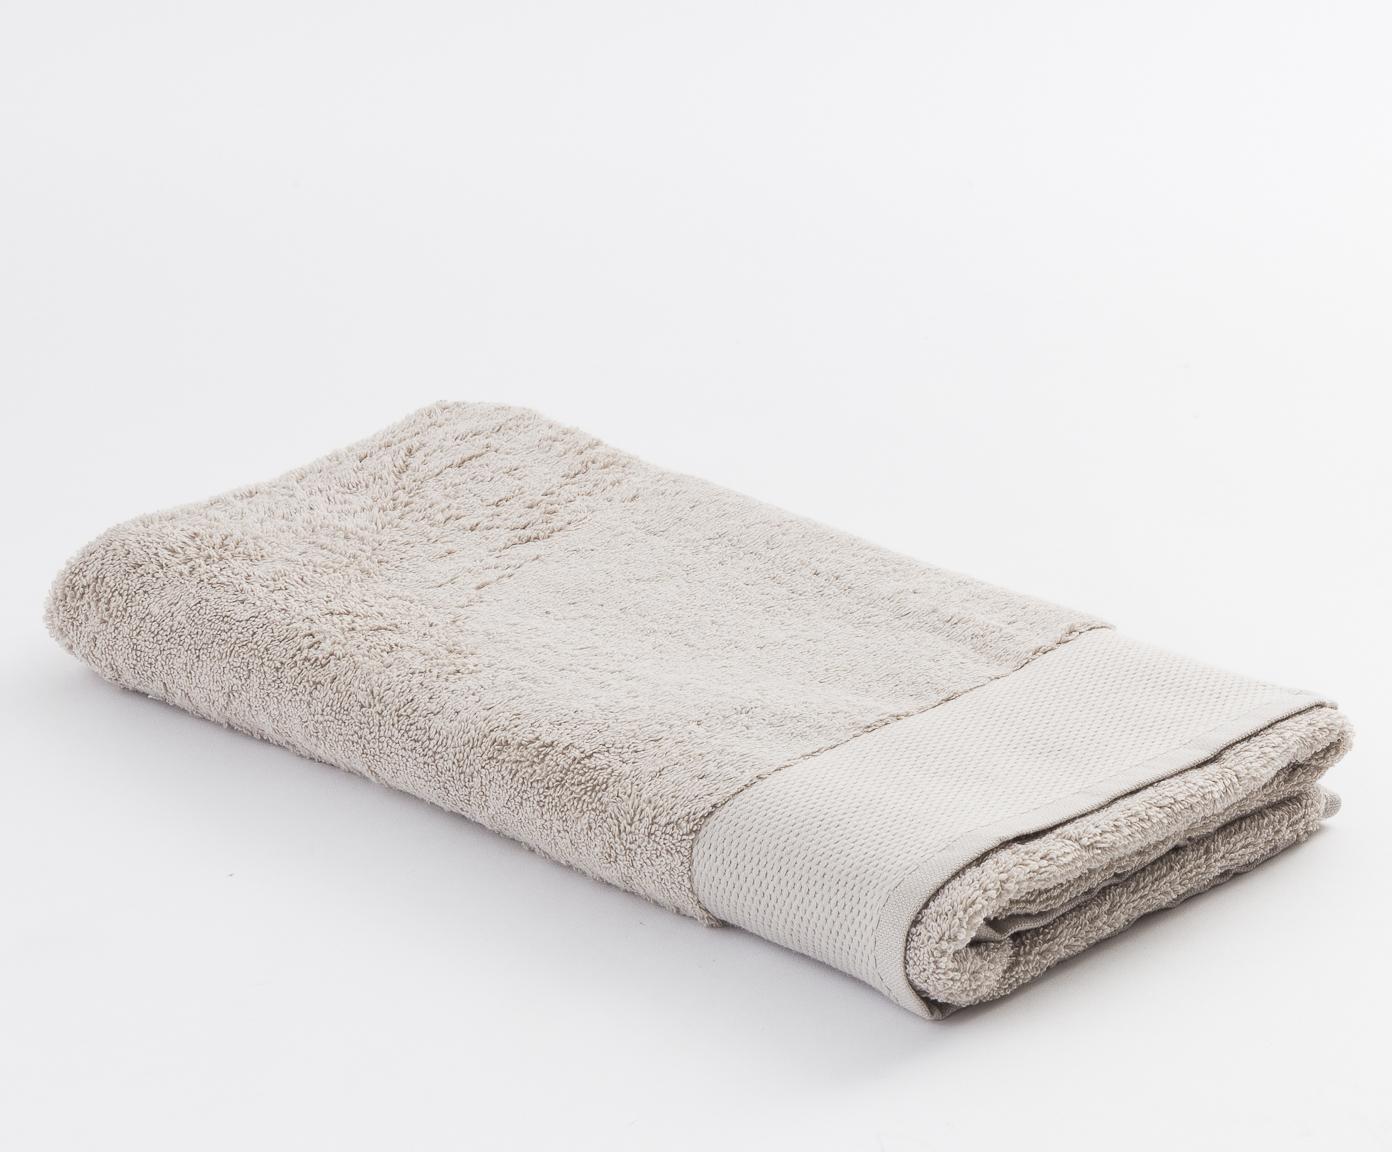 Наборы полотенец Набор полотенец 3 шт Cassera Casa Helios коричневый IT-CO624WWBMWWBIT-2.jpg